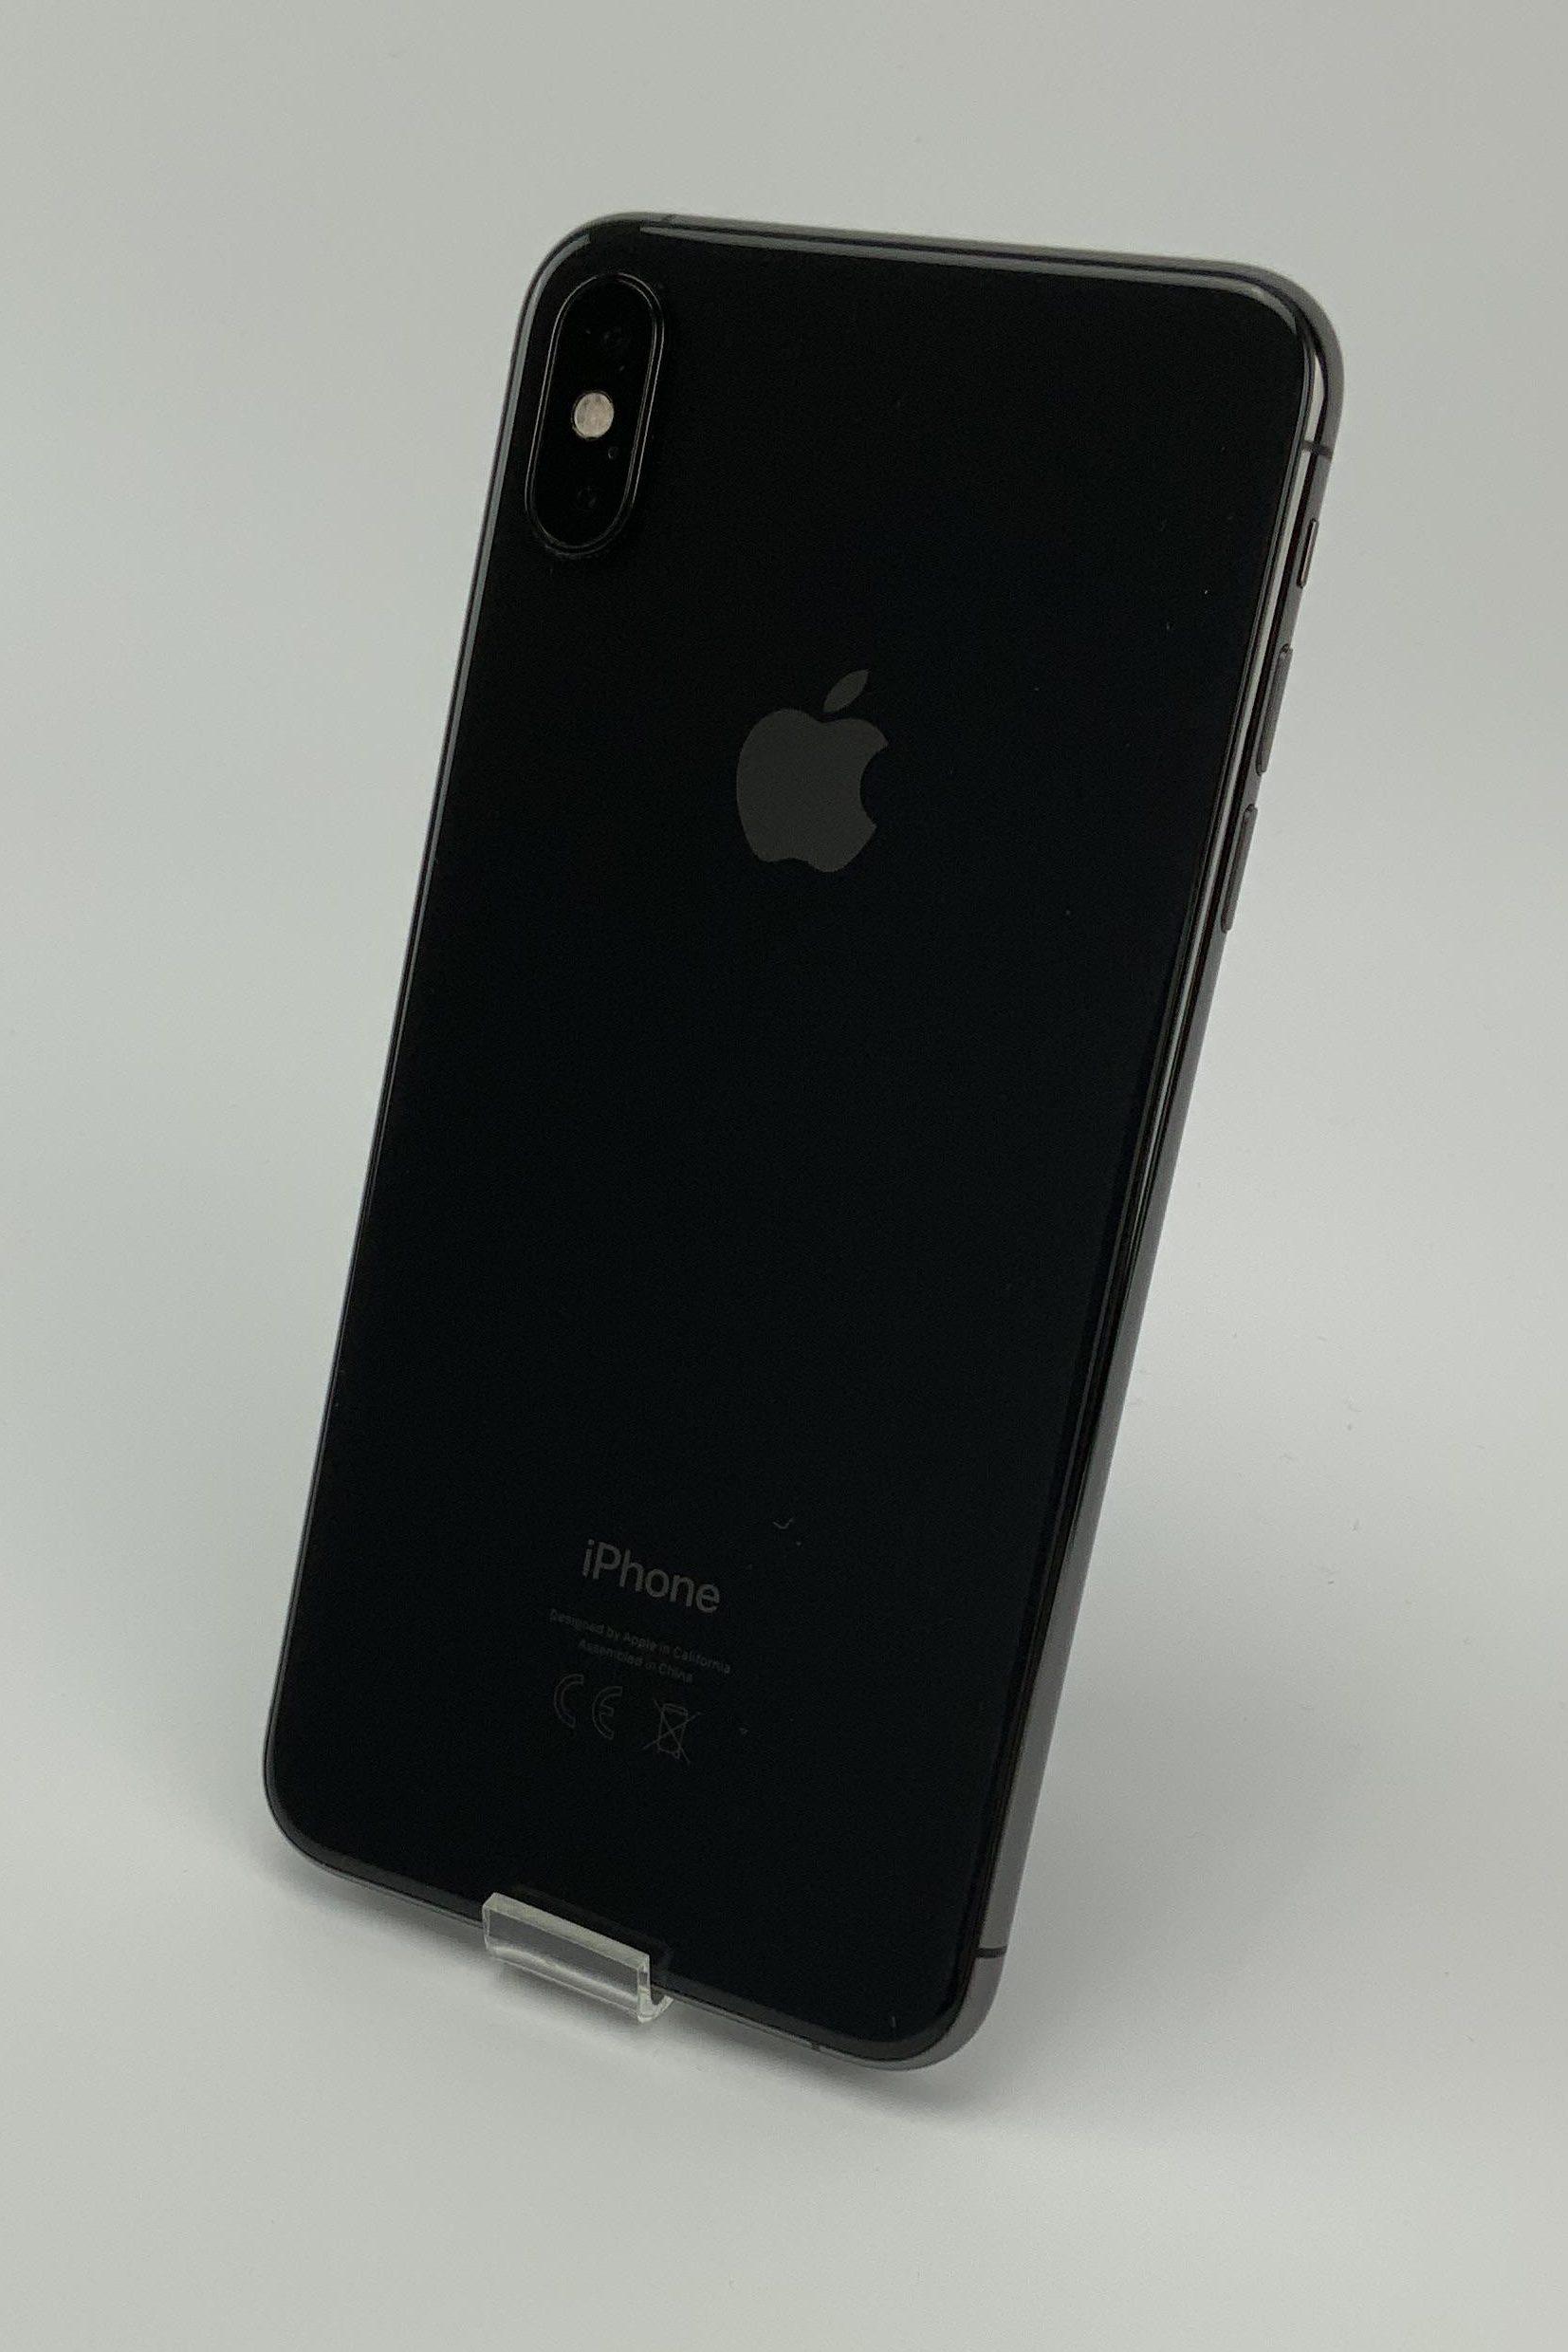 iPhone XS Max 64GB, 64GB, Space Gray, immagine 2